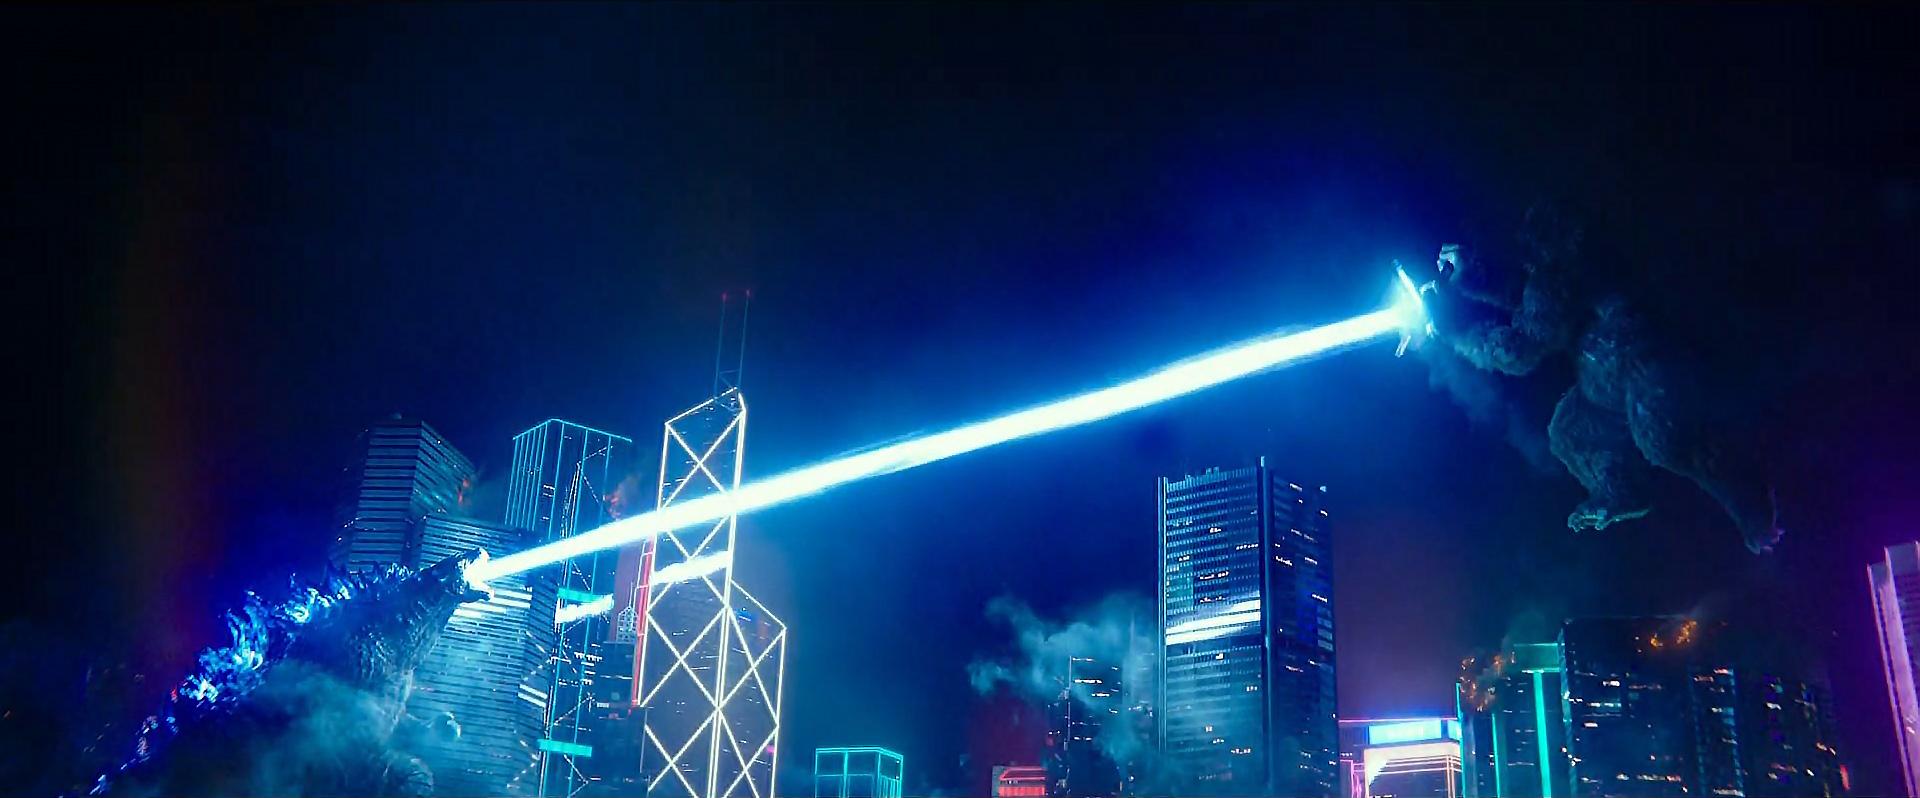 Godzilla vs Kong Trailer Still 77 - Kong blocks Godzilla's Atomic Breath